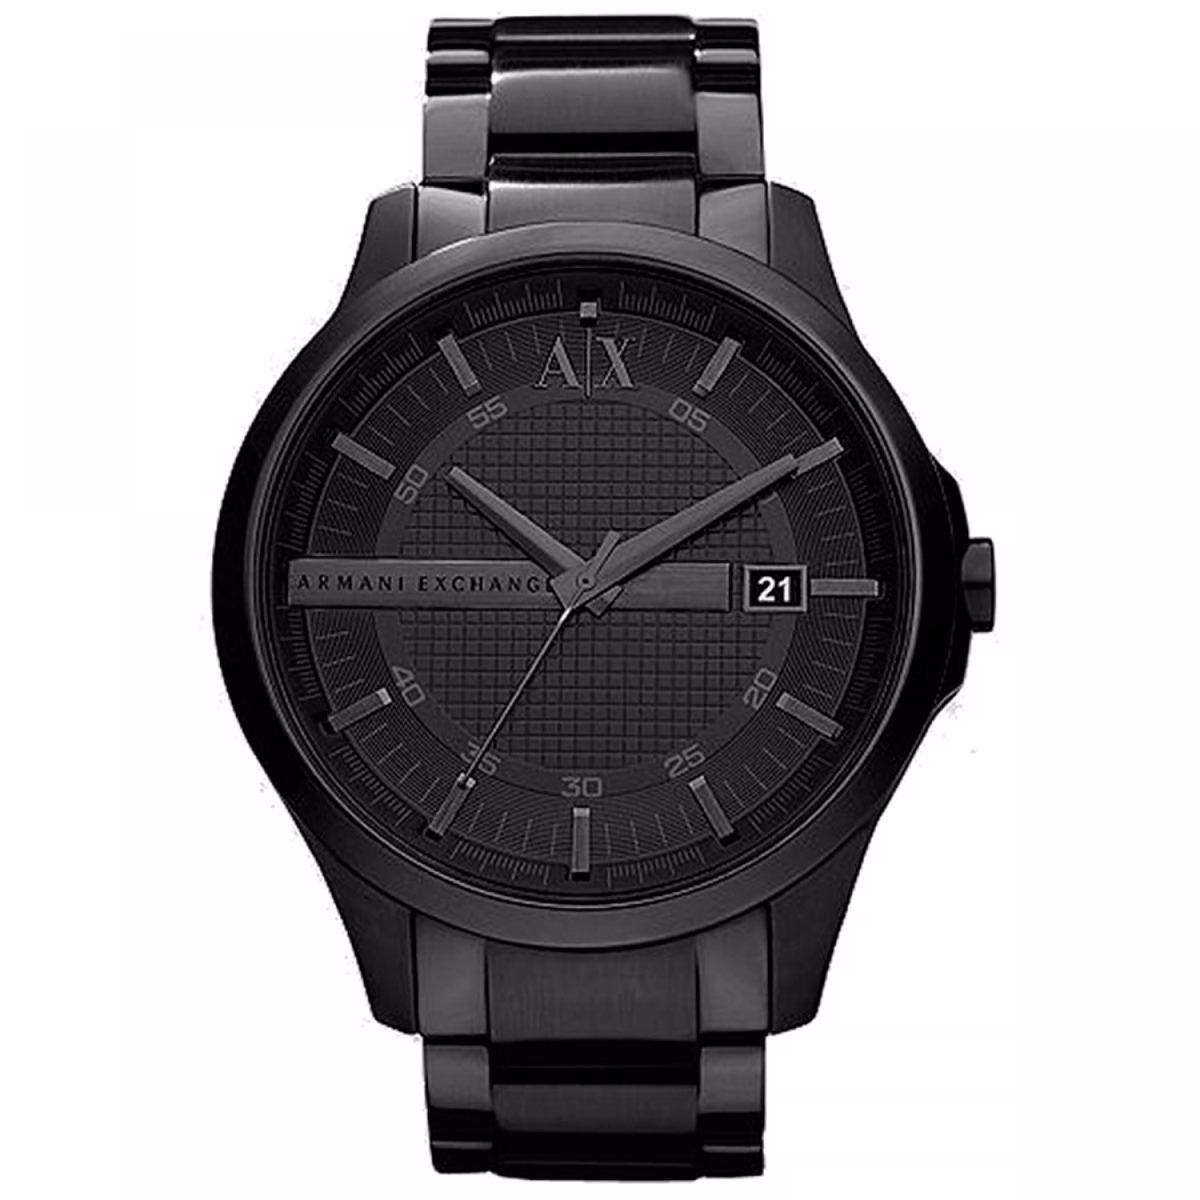 Relógio Masculino Armani Exchange Original - Ax2135 - R  799,99 em ... b176612ab4